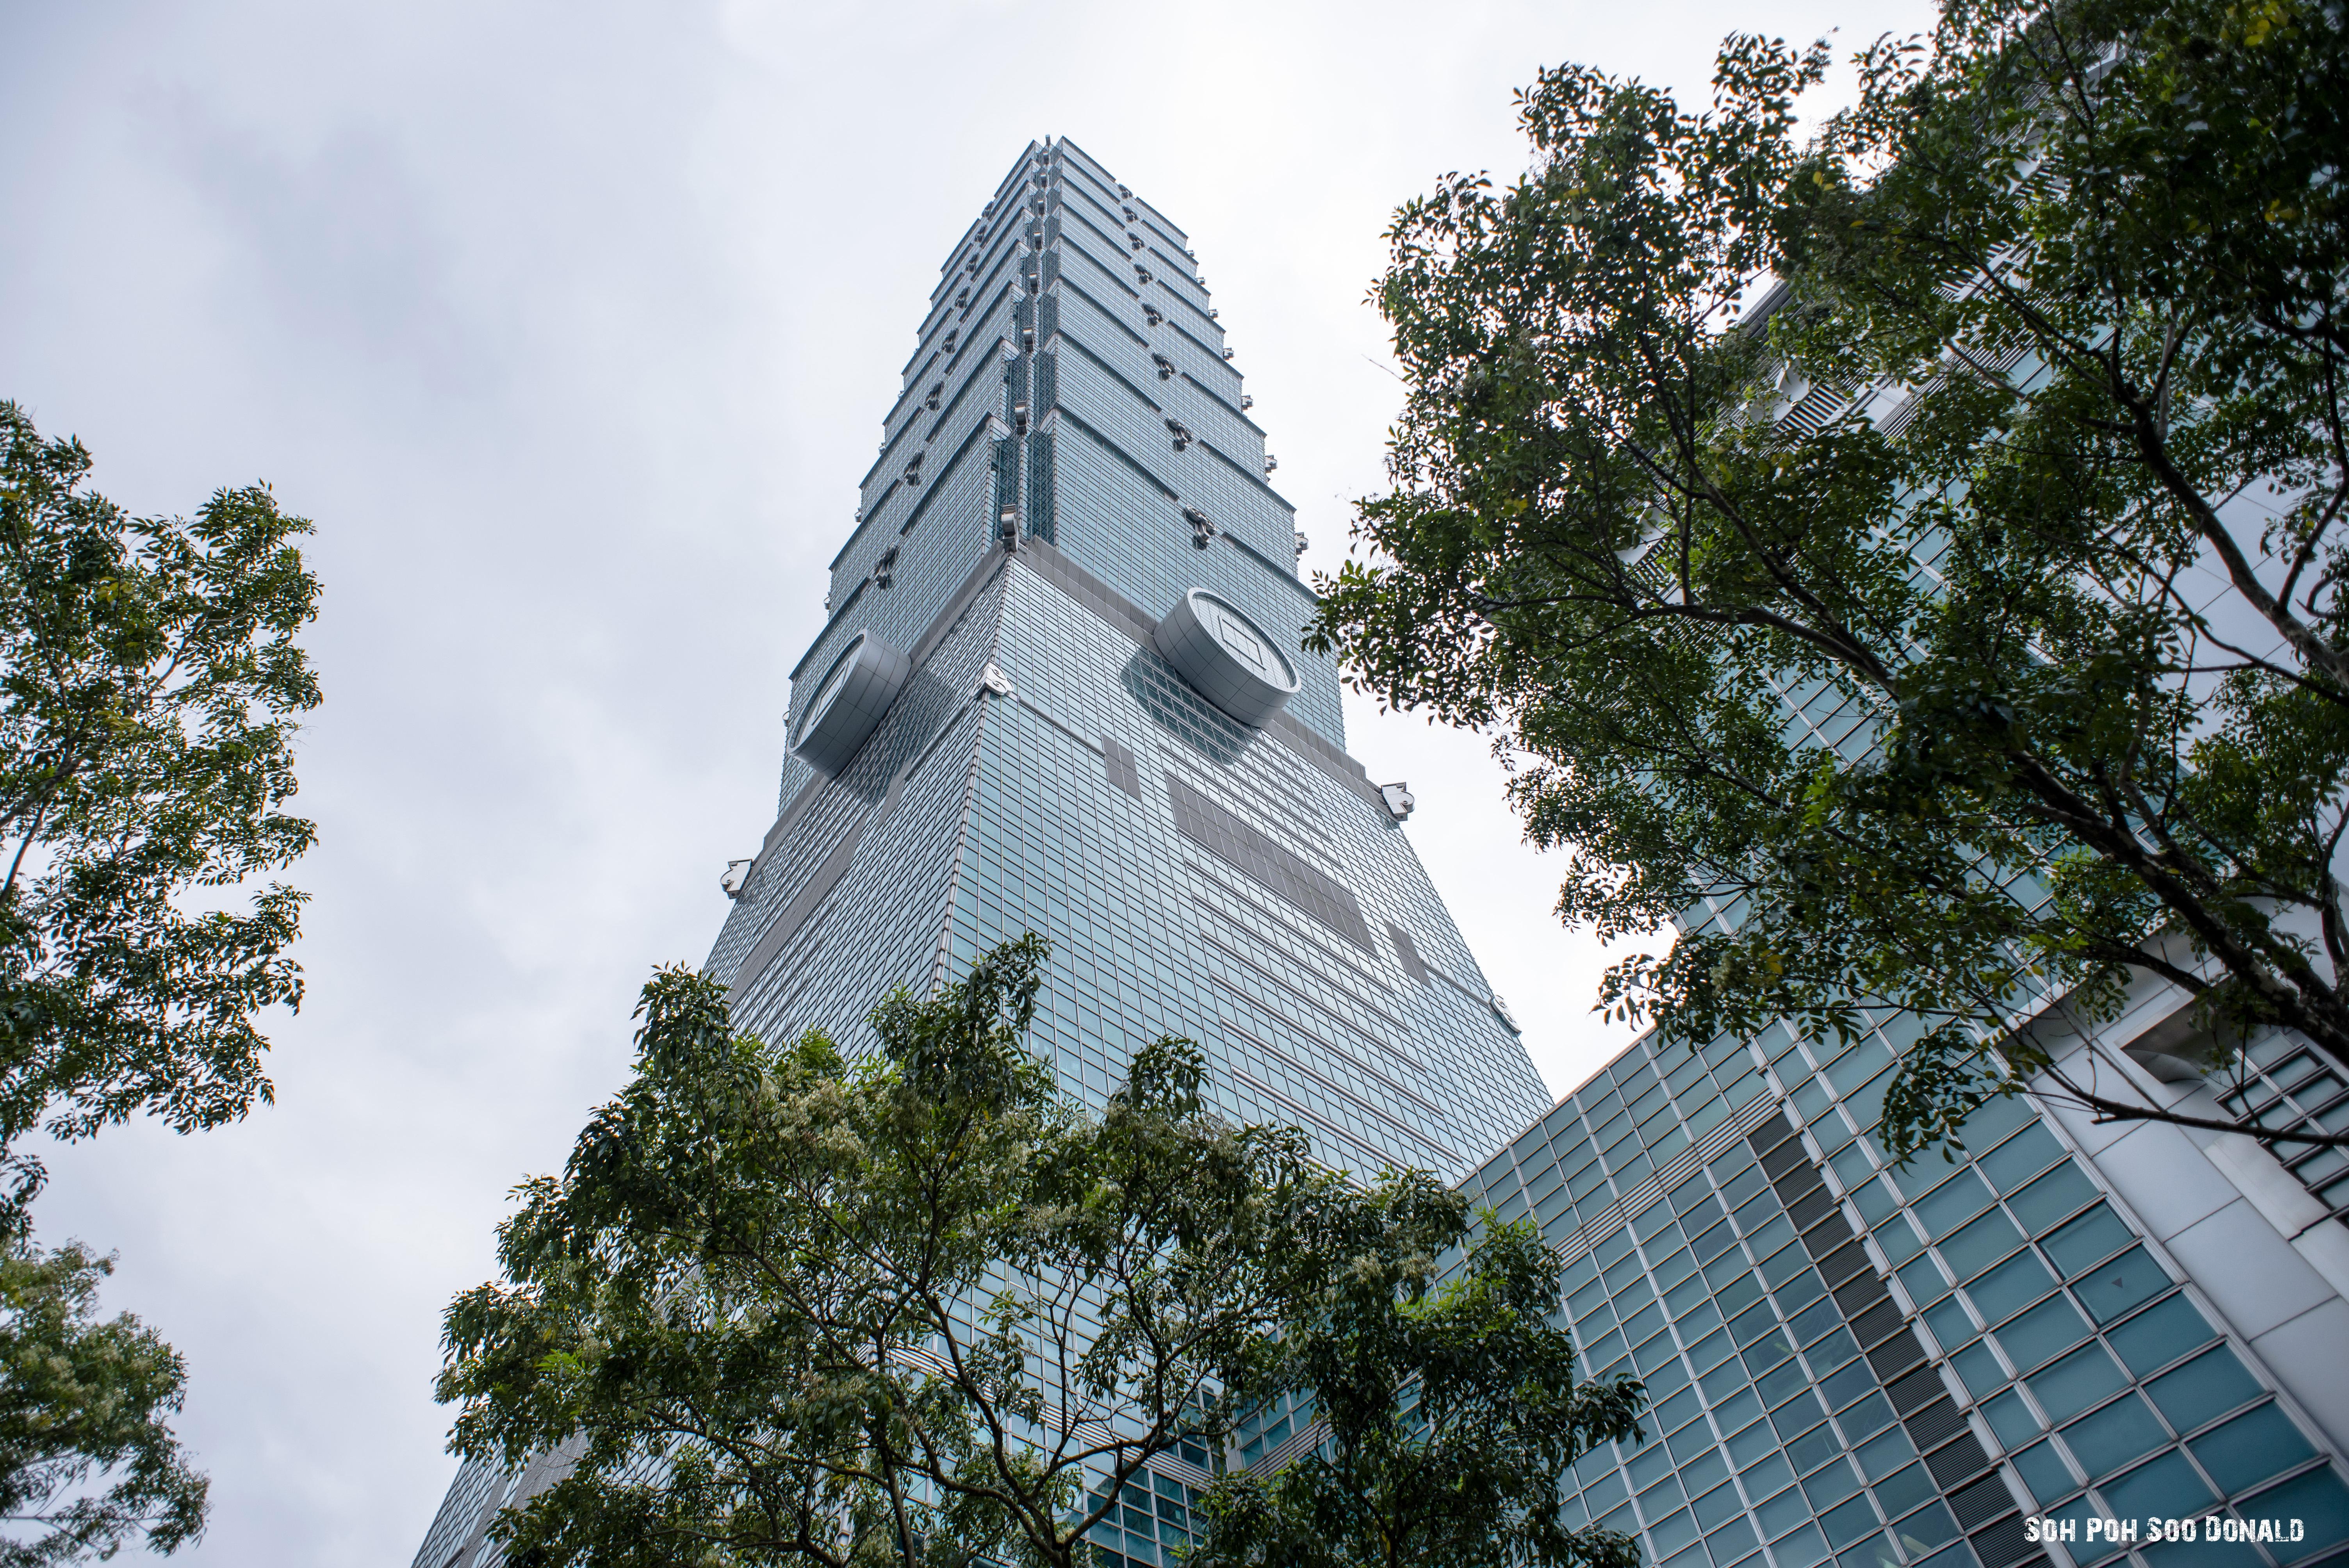 Hsinchu/Nantou/Taipei 2019